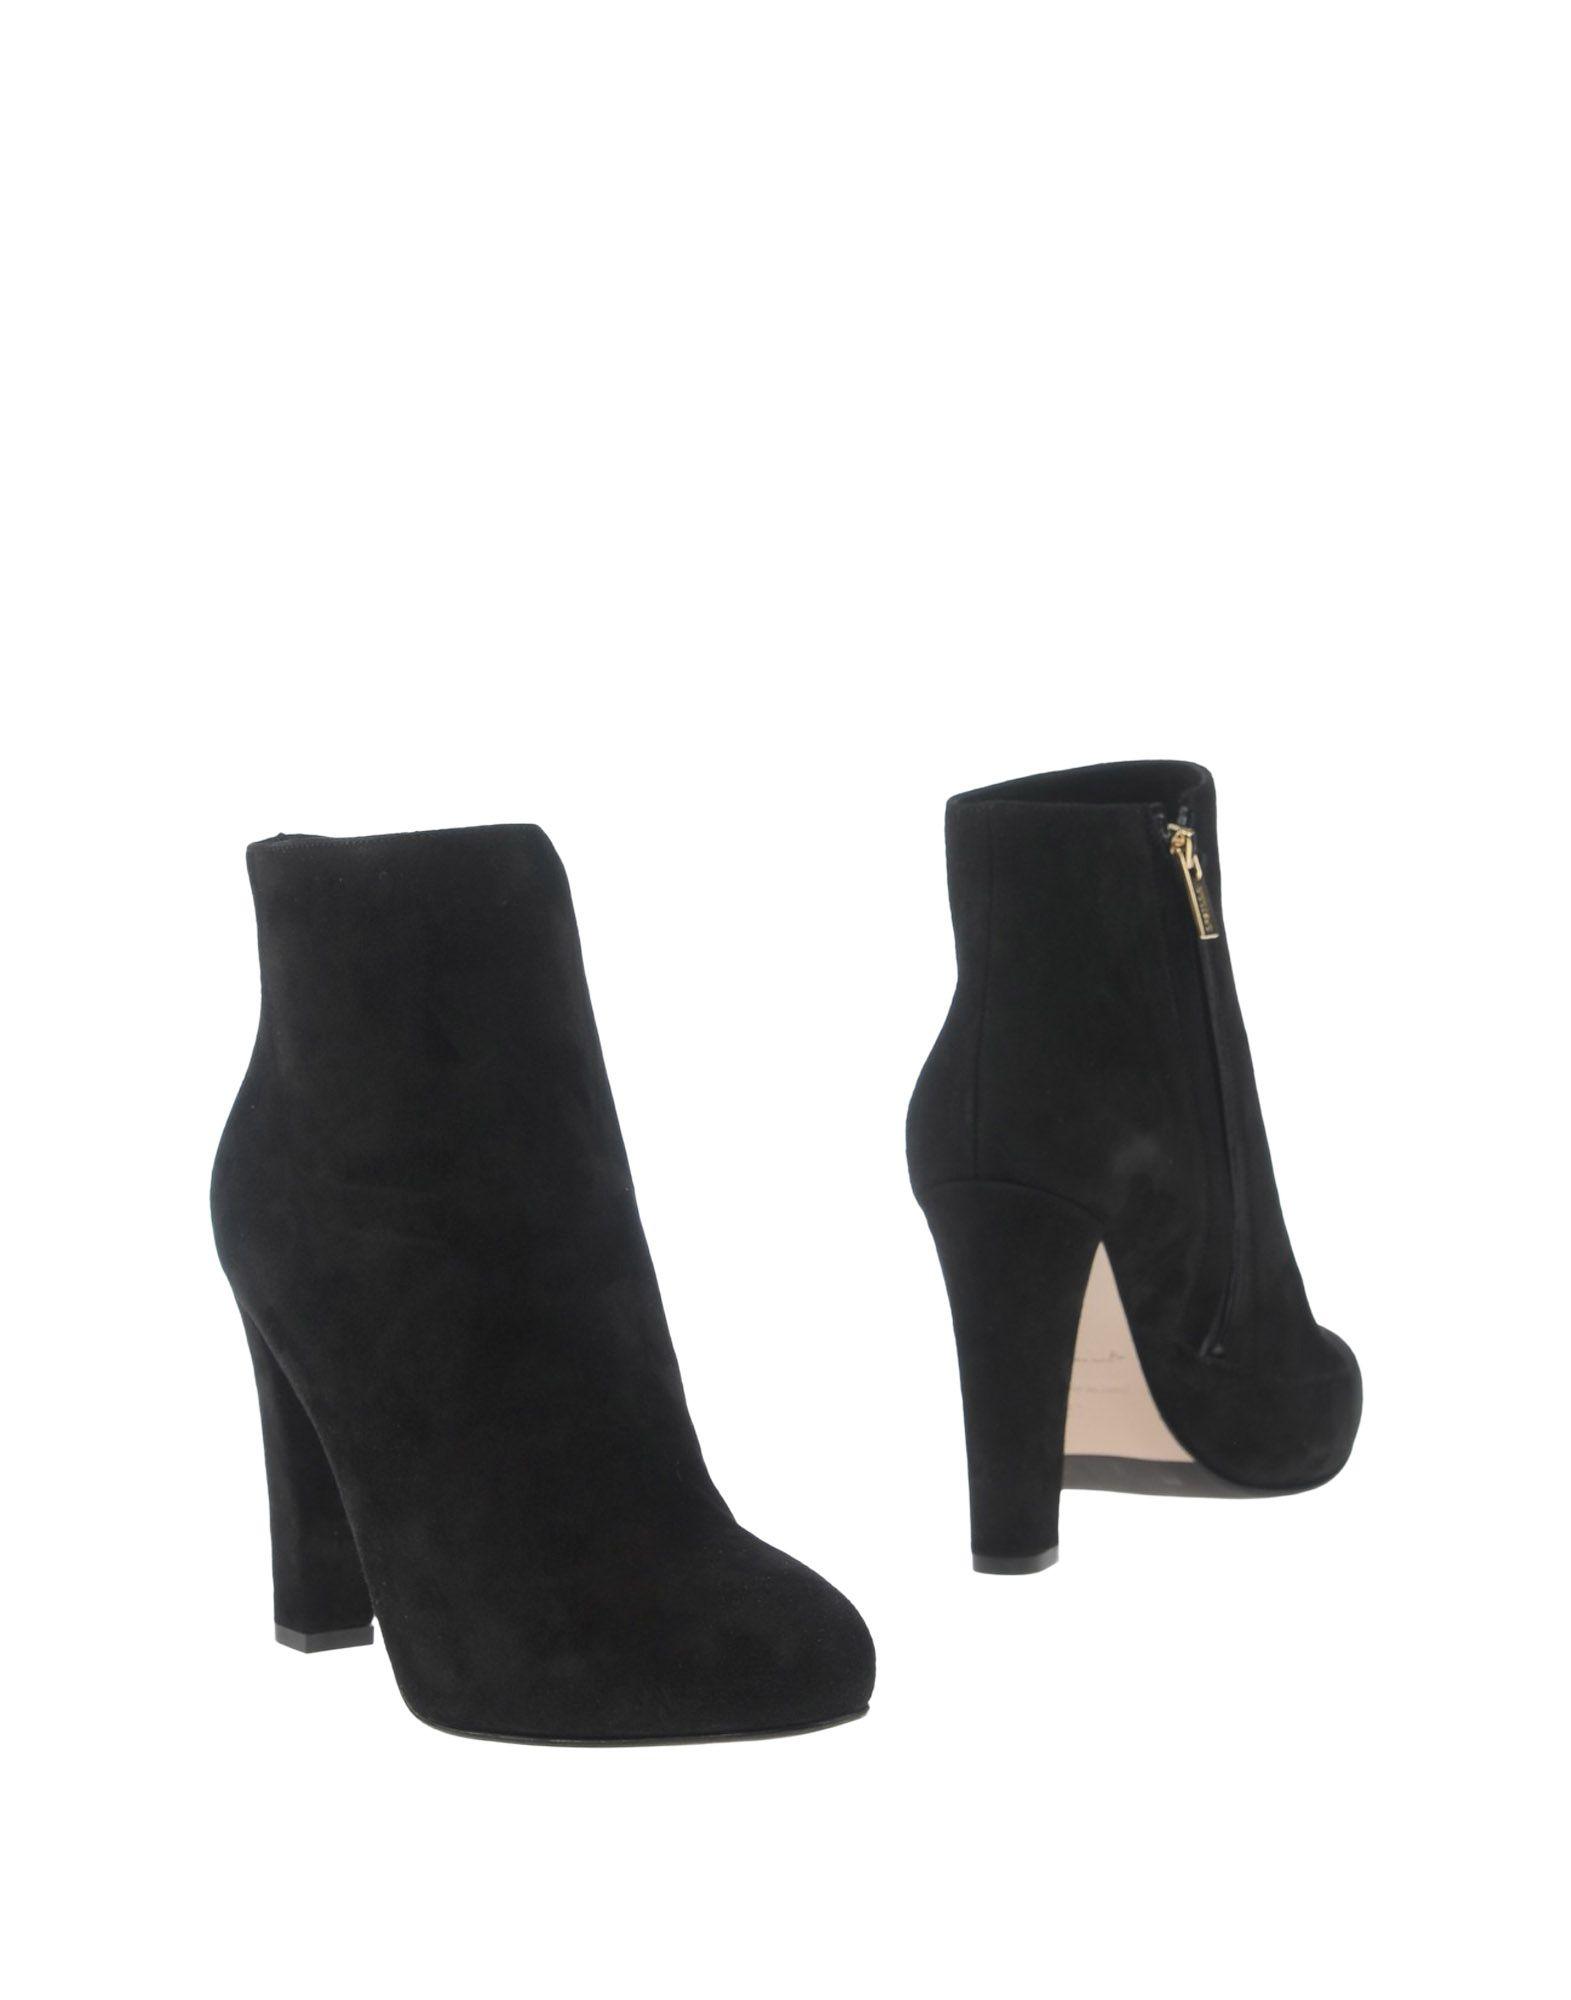 Le Silla Stiefelette Damen  11287487QHGut aussehende aussehende aussehende strapazierfähige Schuhe ae22af